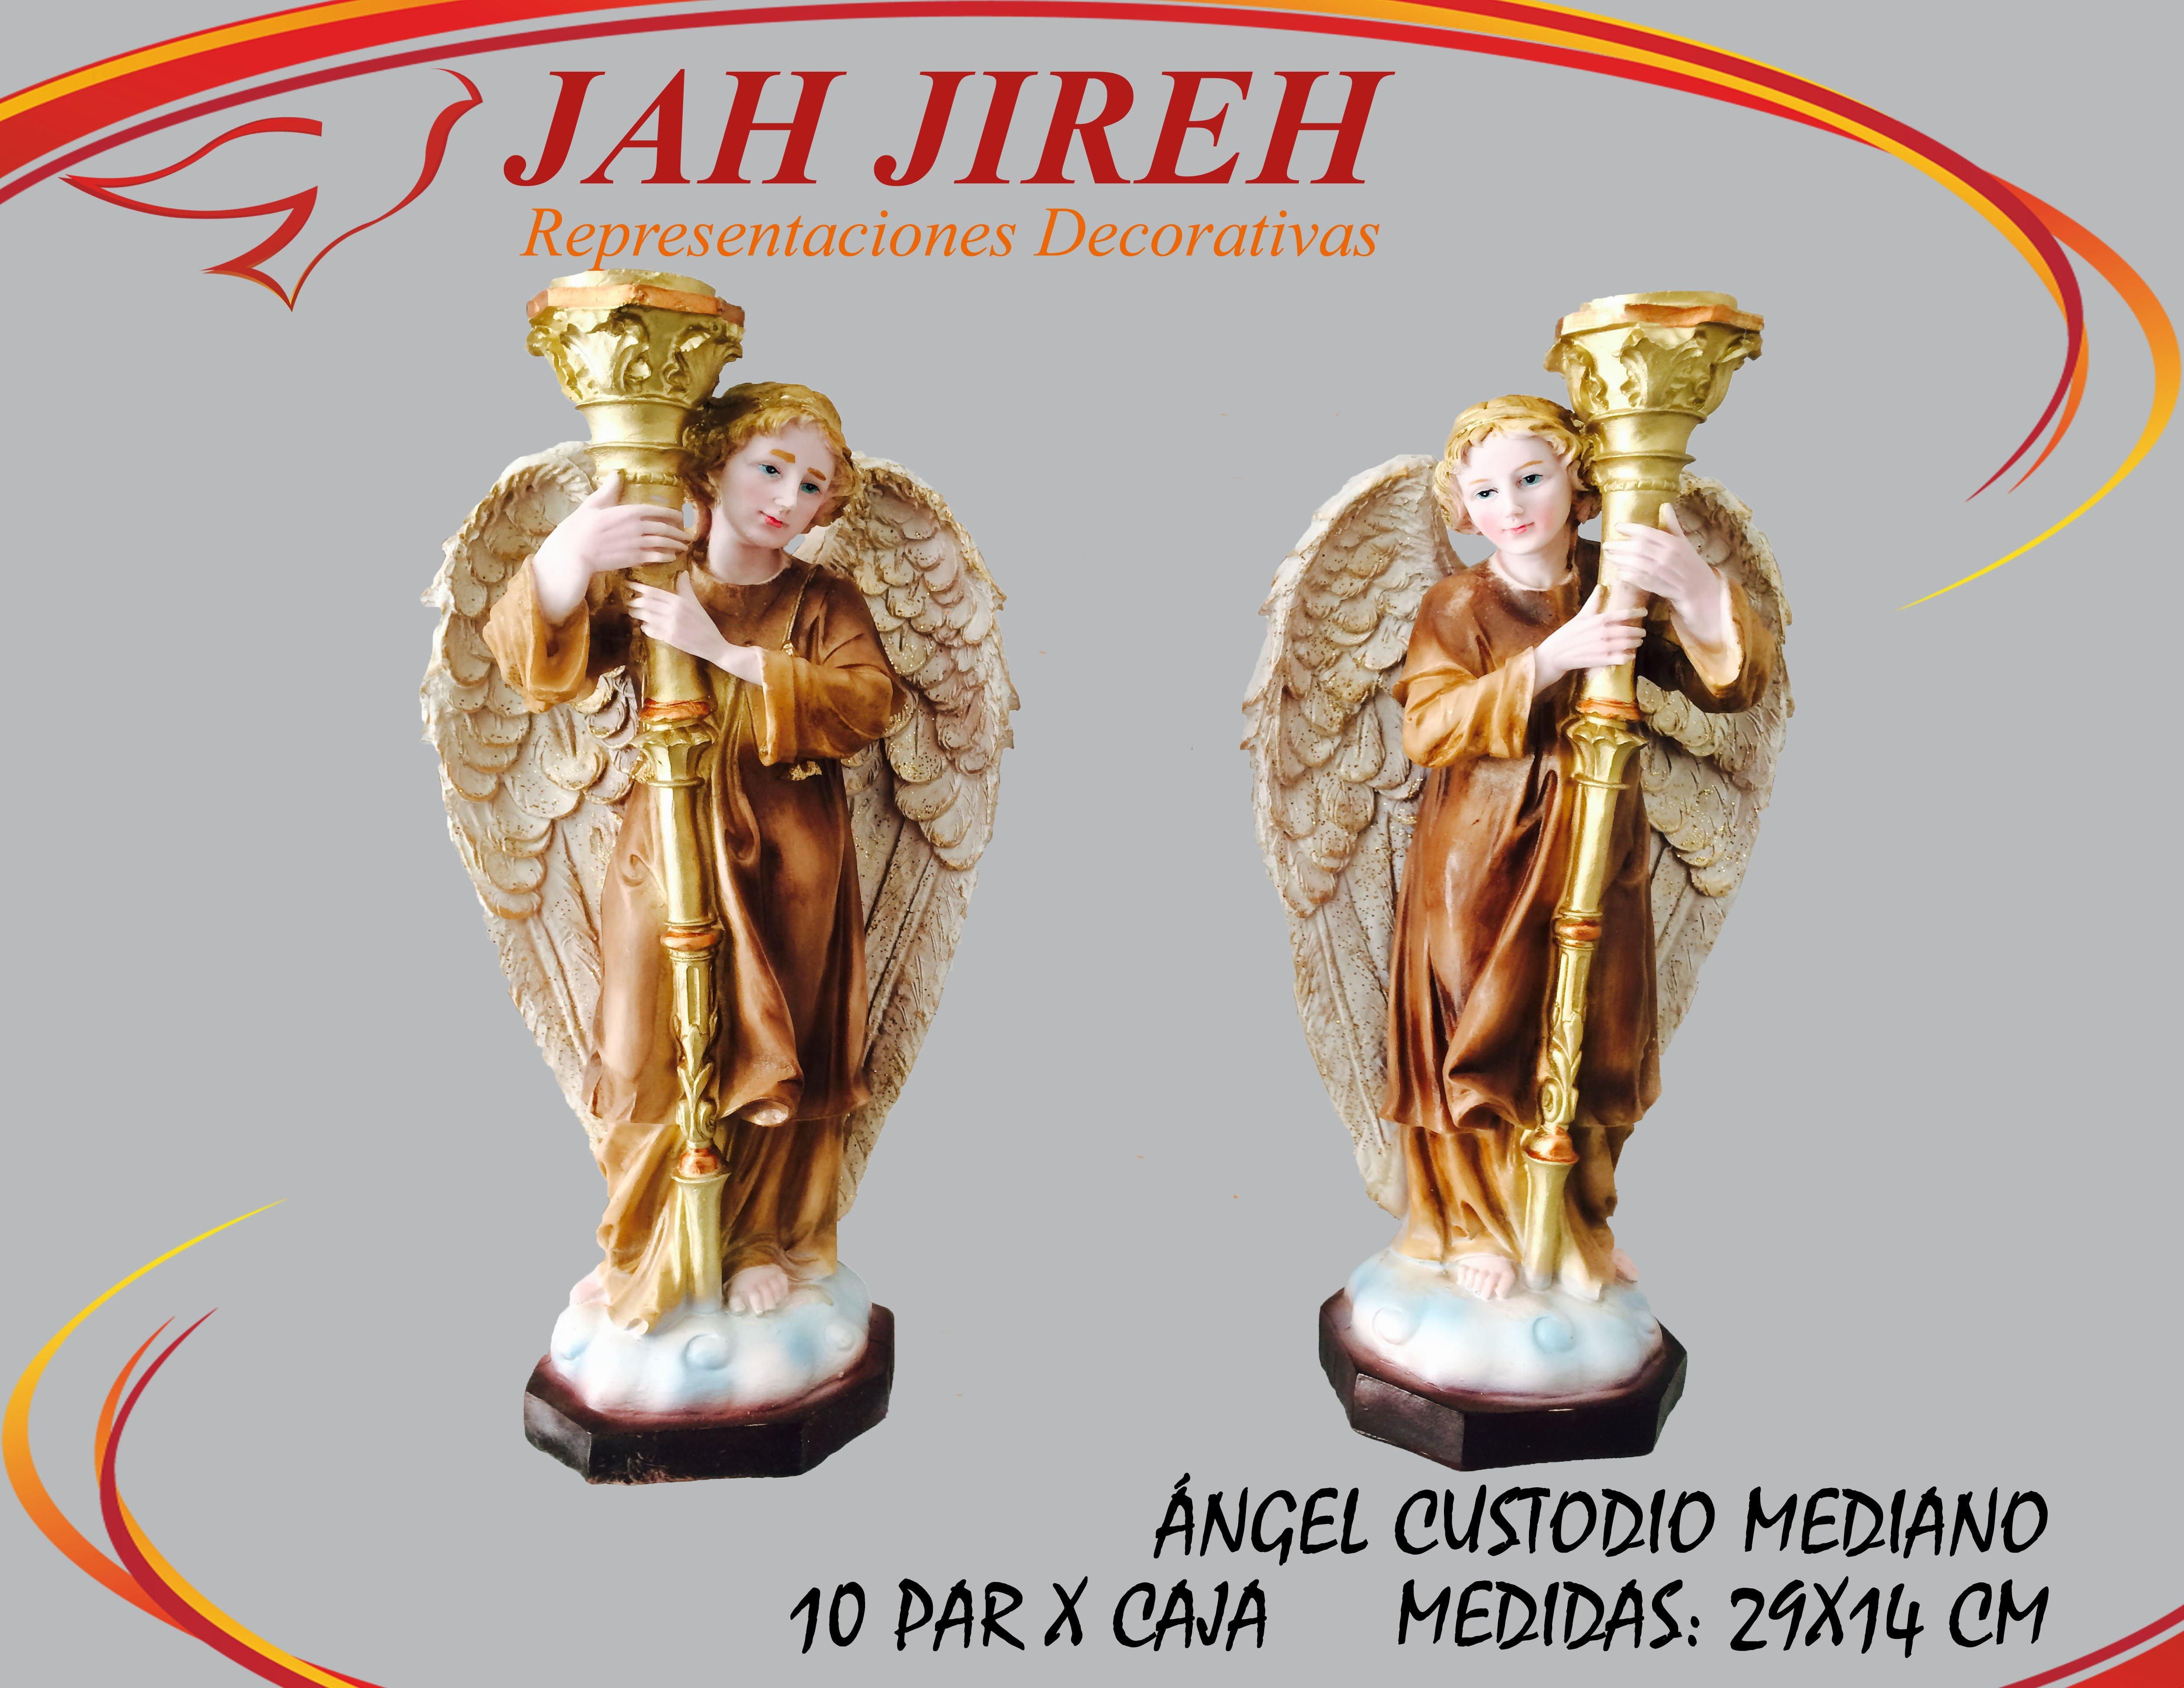 https://0201.nccdn.net/1_2/000/000/0d8/4b1/angel-custodio-mediano.jpg